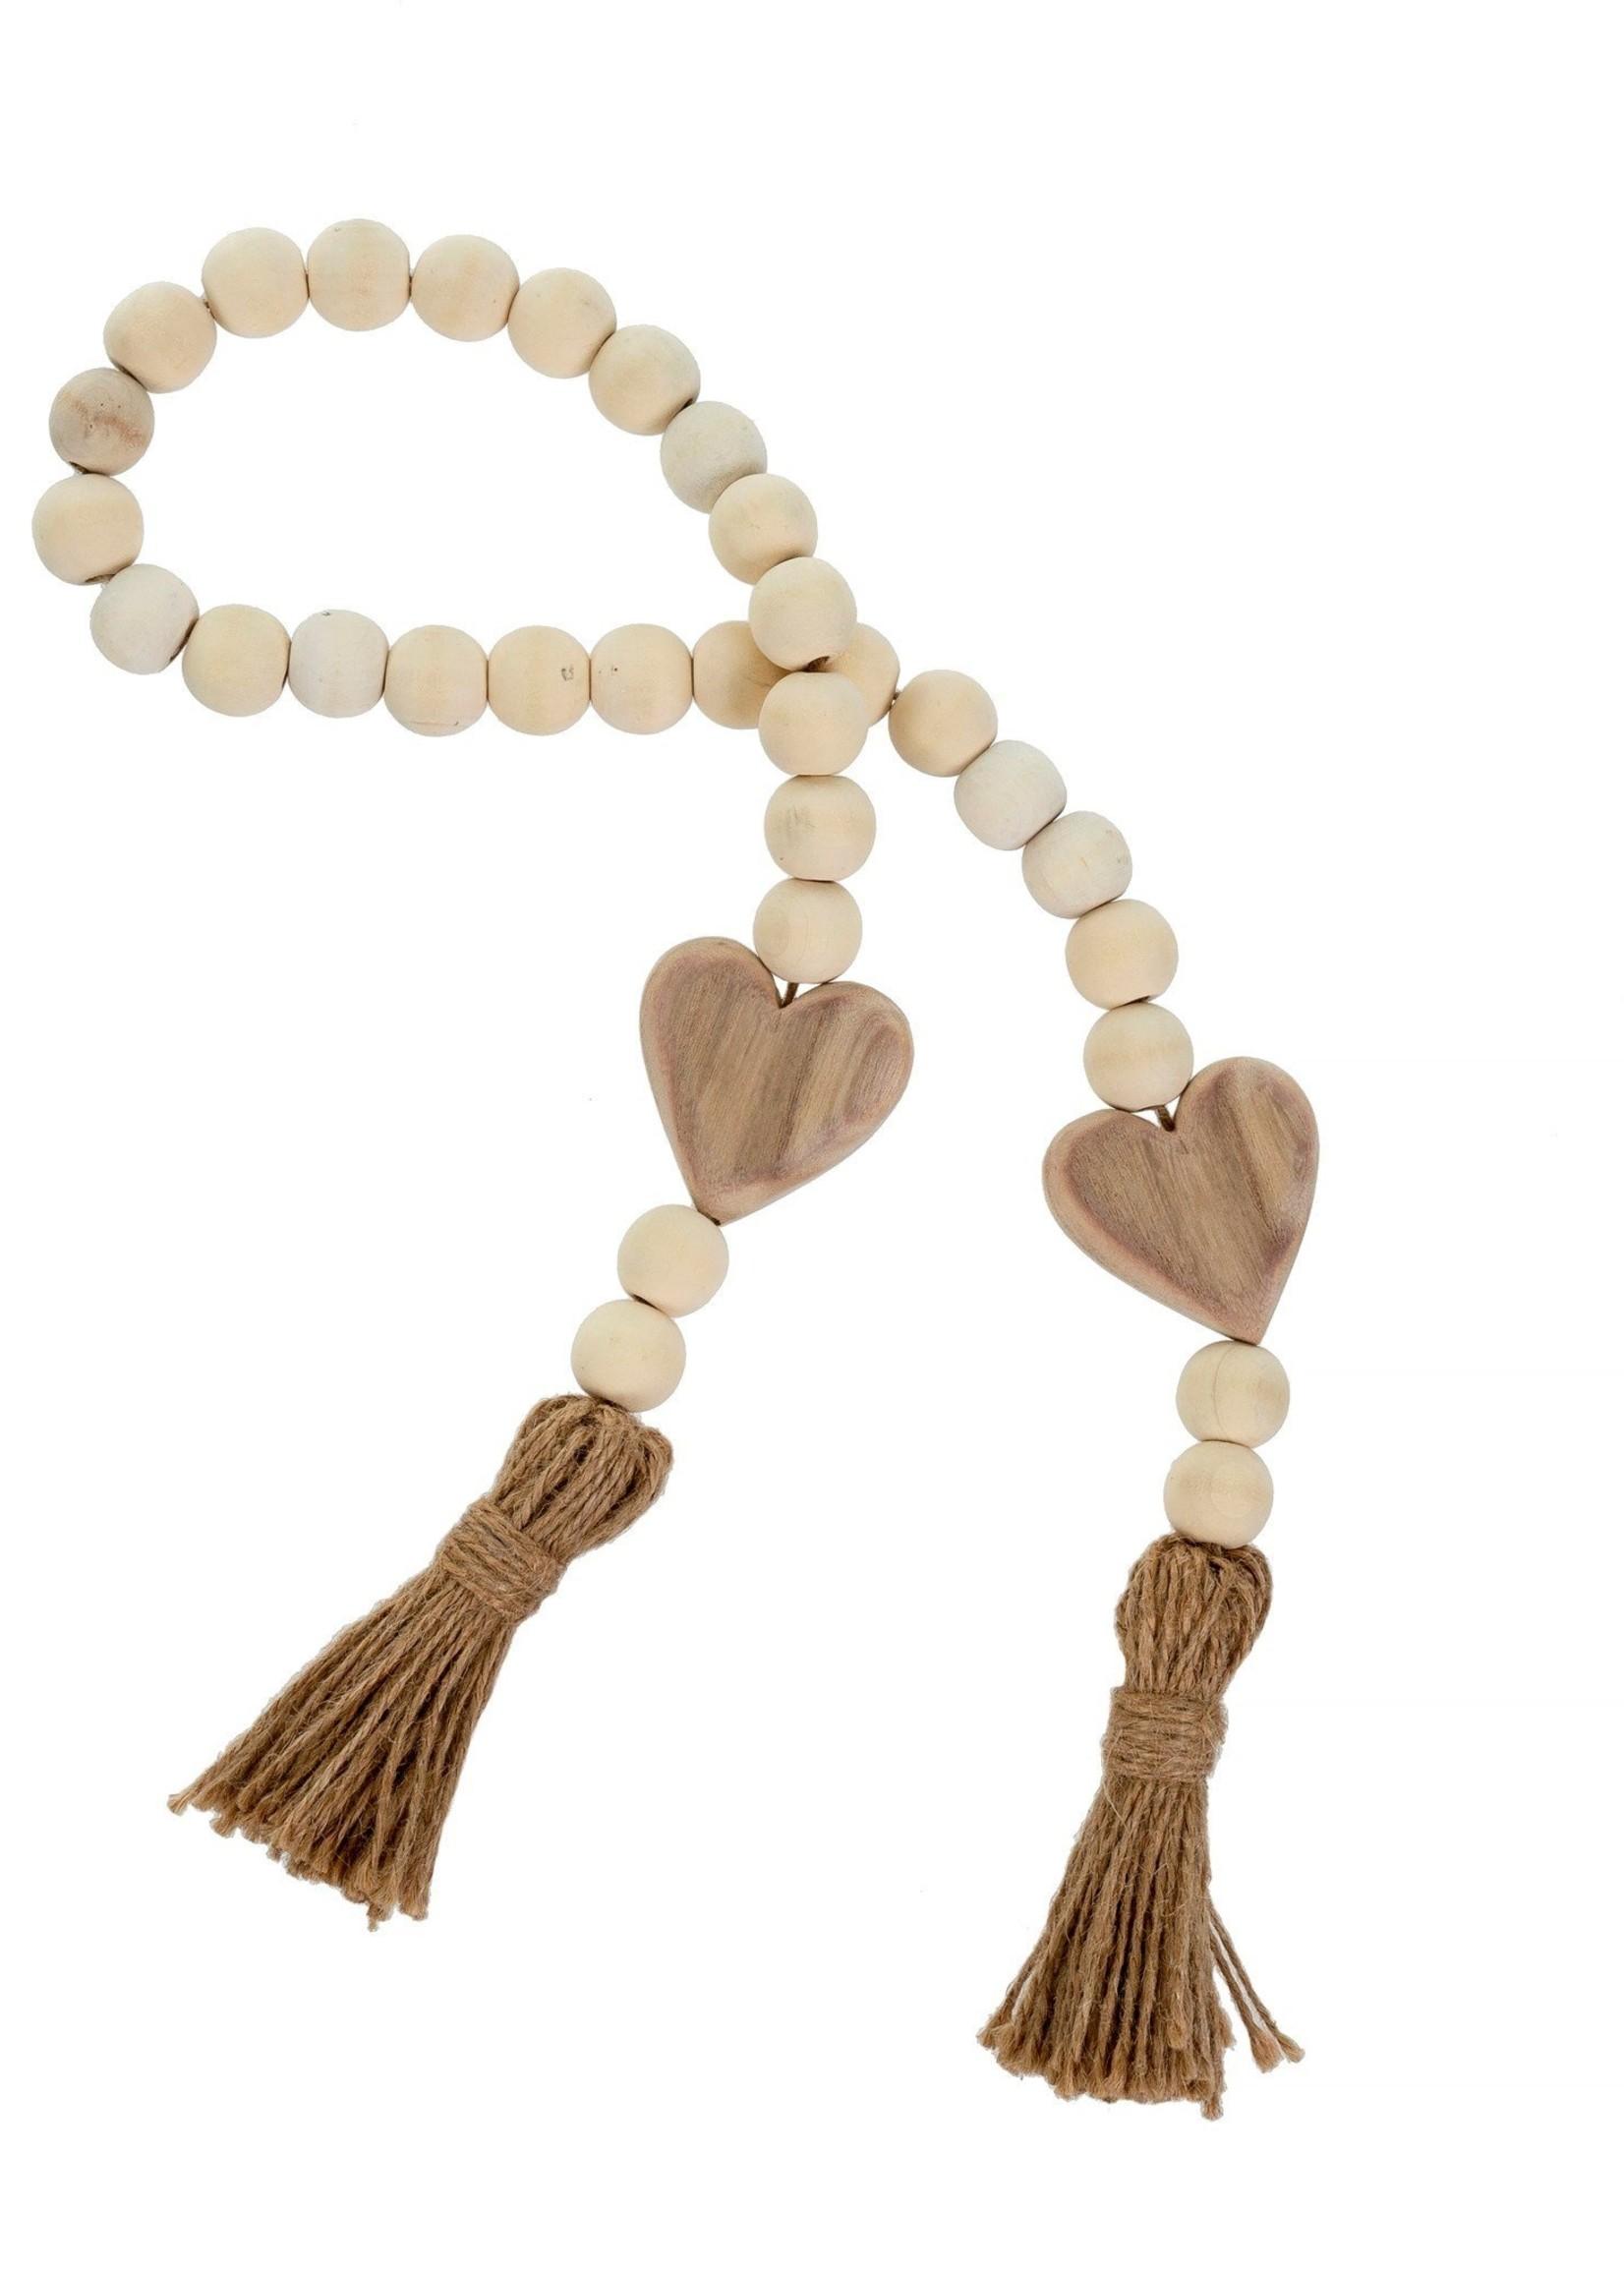 Indaba Trading Co Prayer Beads - Natural